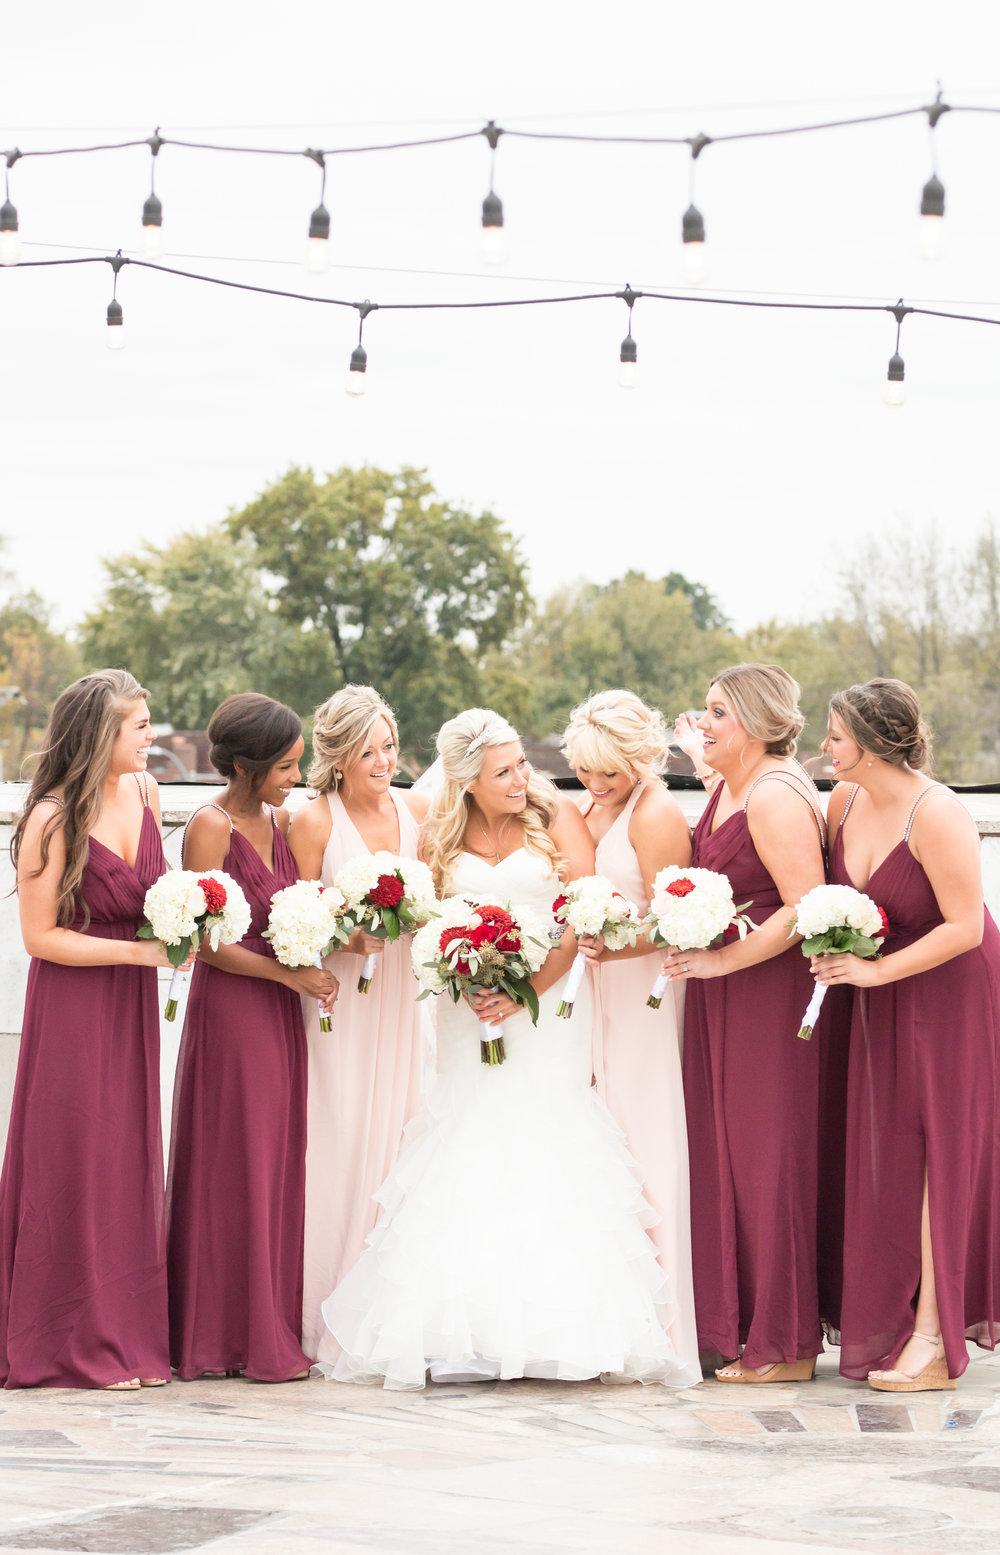 Jessica & Kurtis Wedding_15 - 20171028.jpg